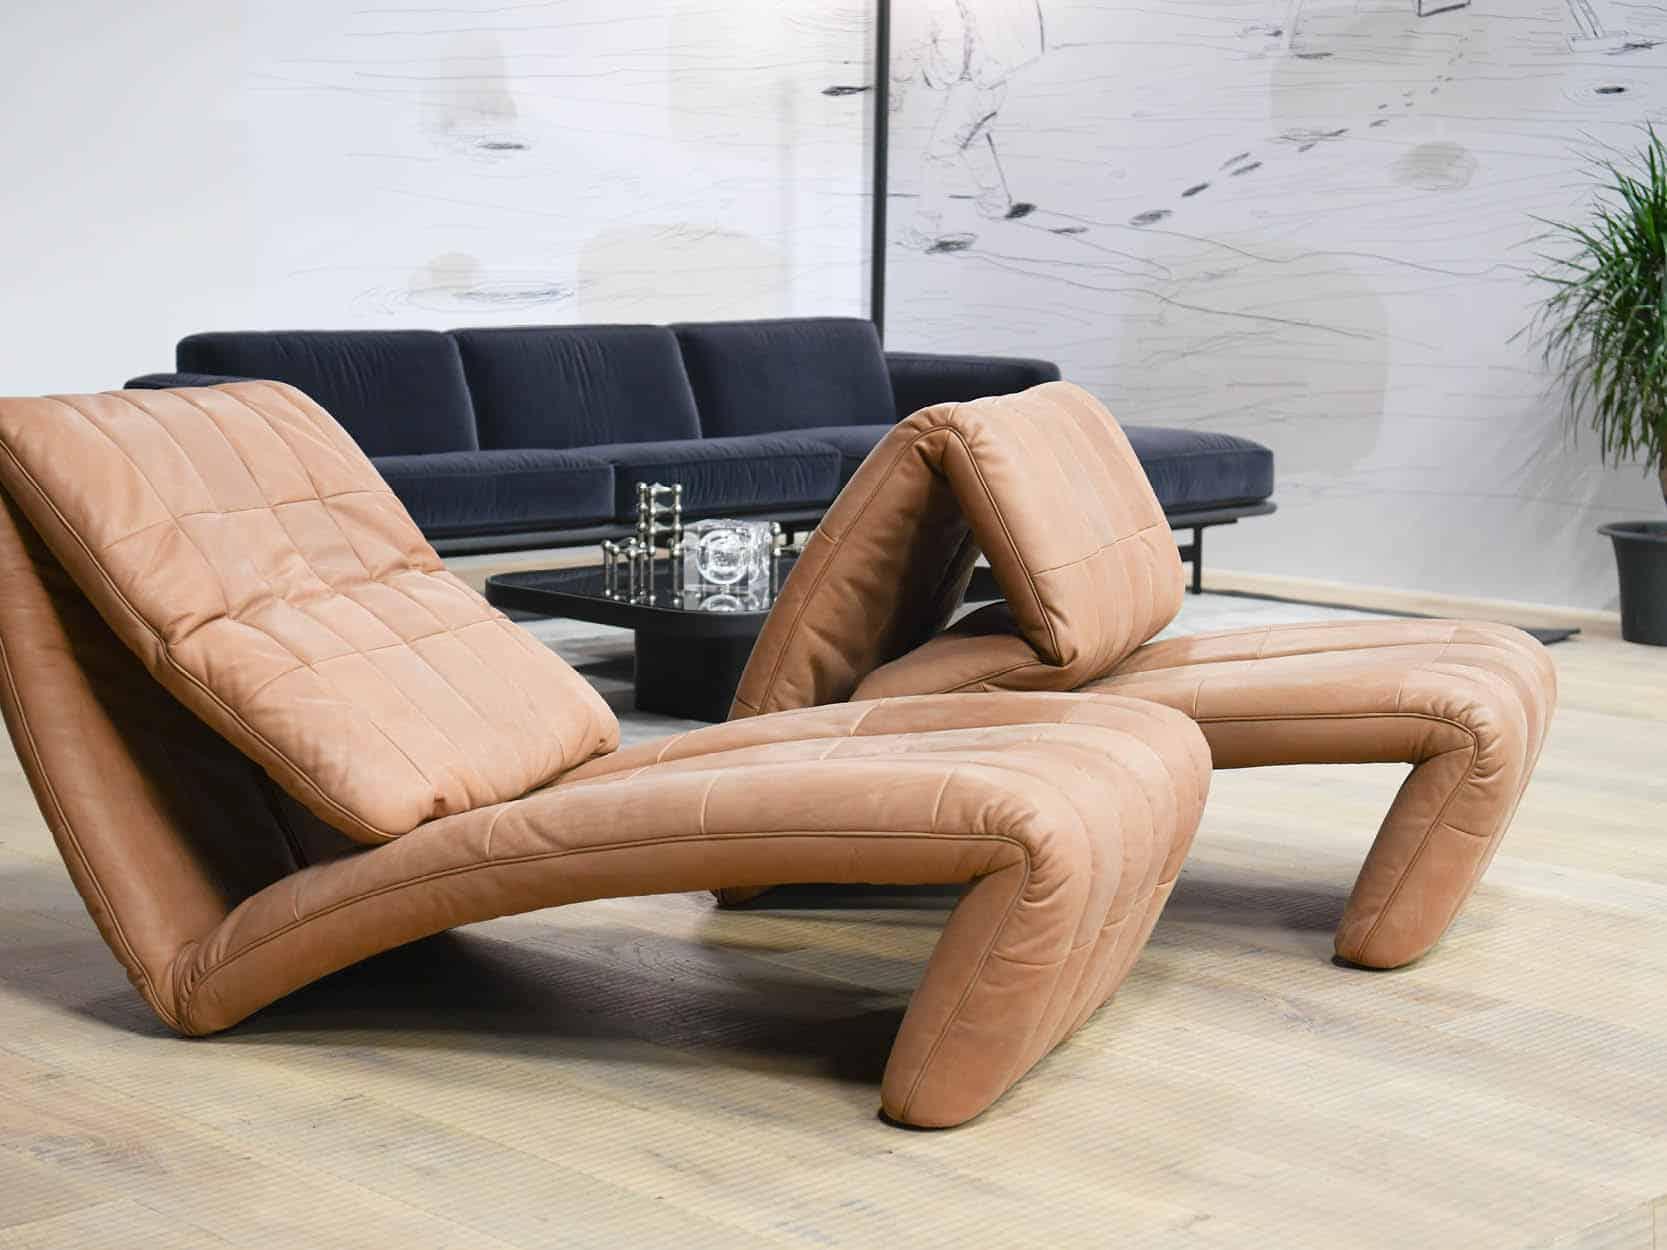 De Sede fauteuil DS-266 sfeer